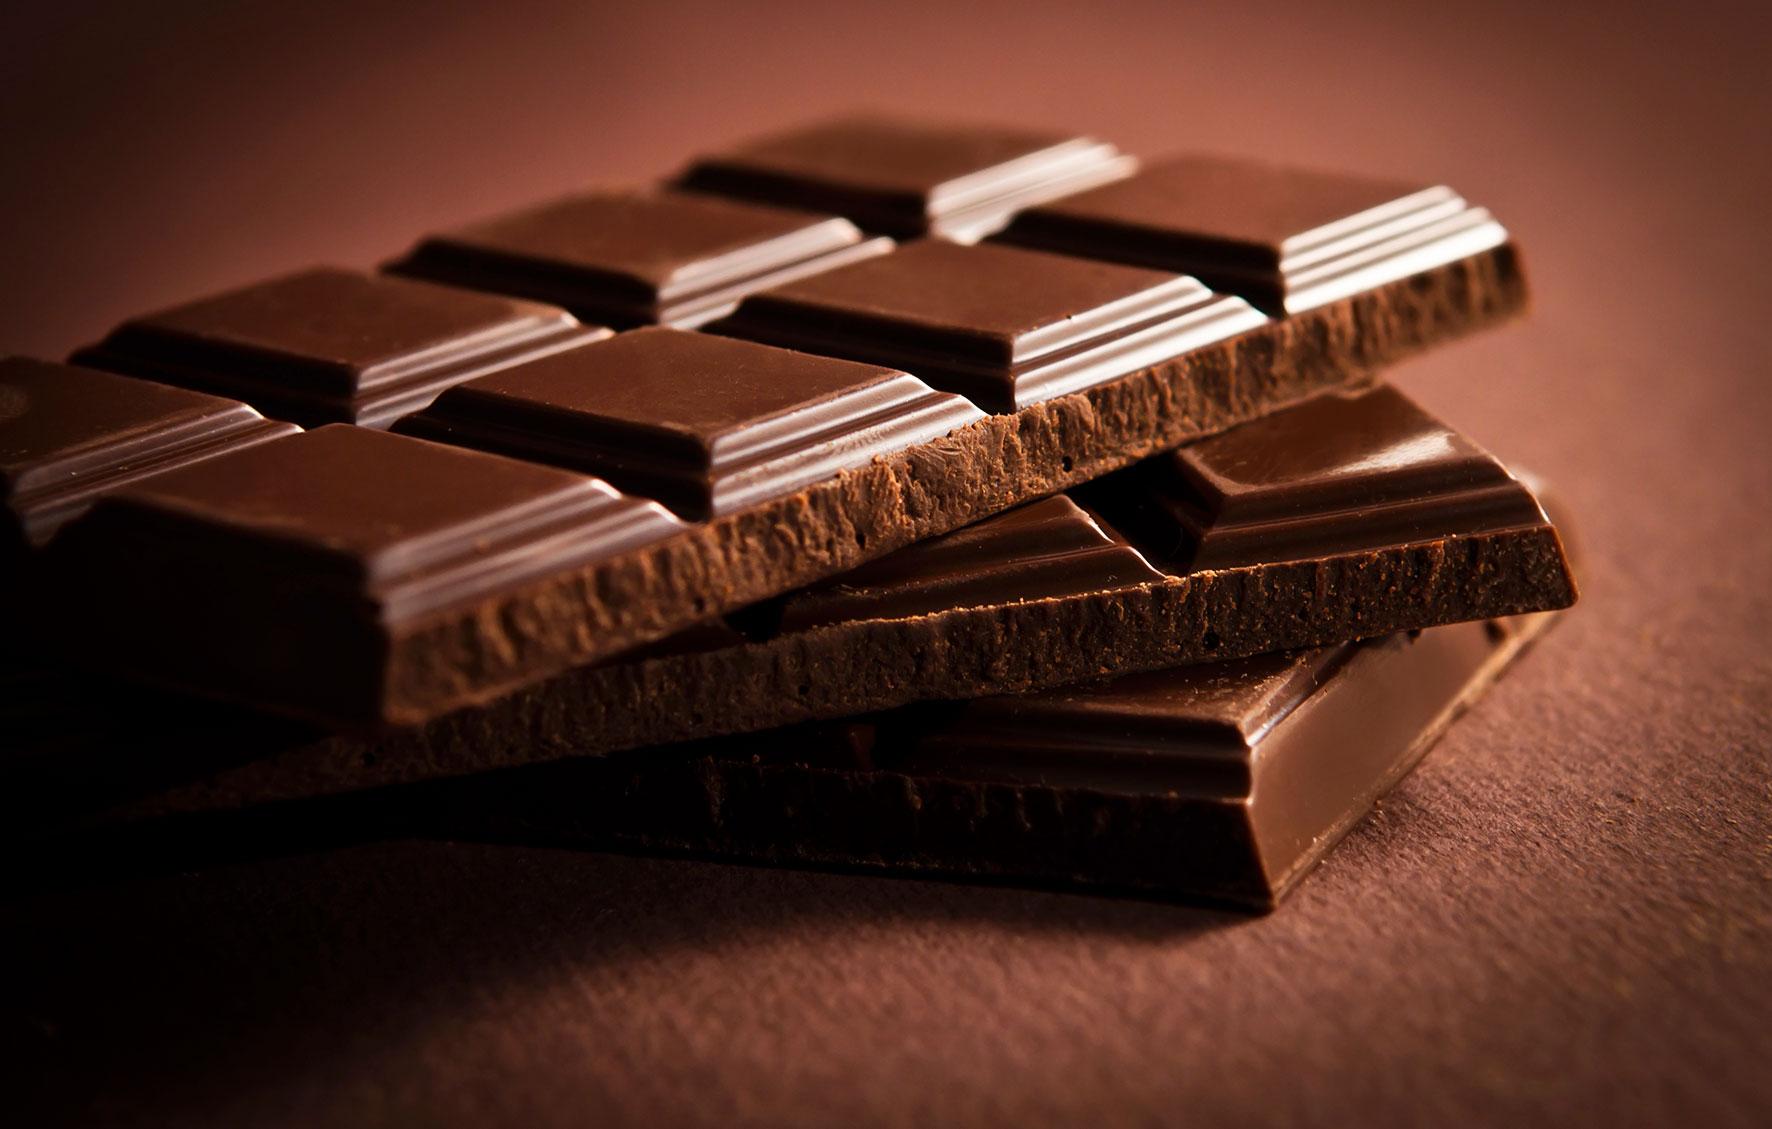 2015 02 21-Esthechoc-il-cioccolato-ce-ringiovnisce-la-pelle-news-karotina-bellezza-blog